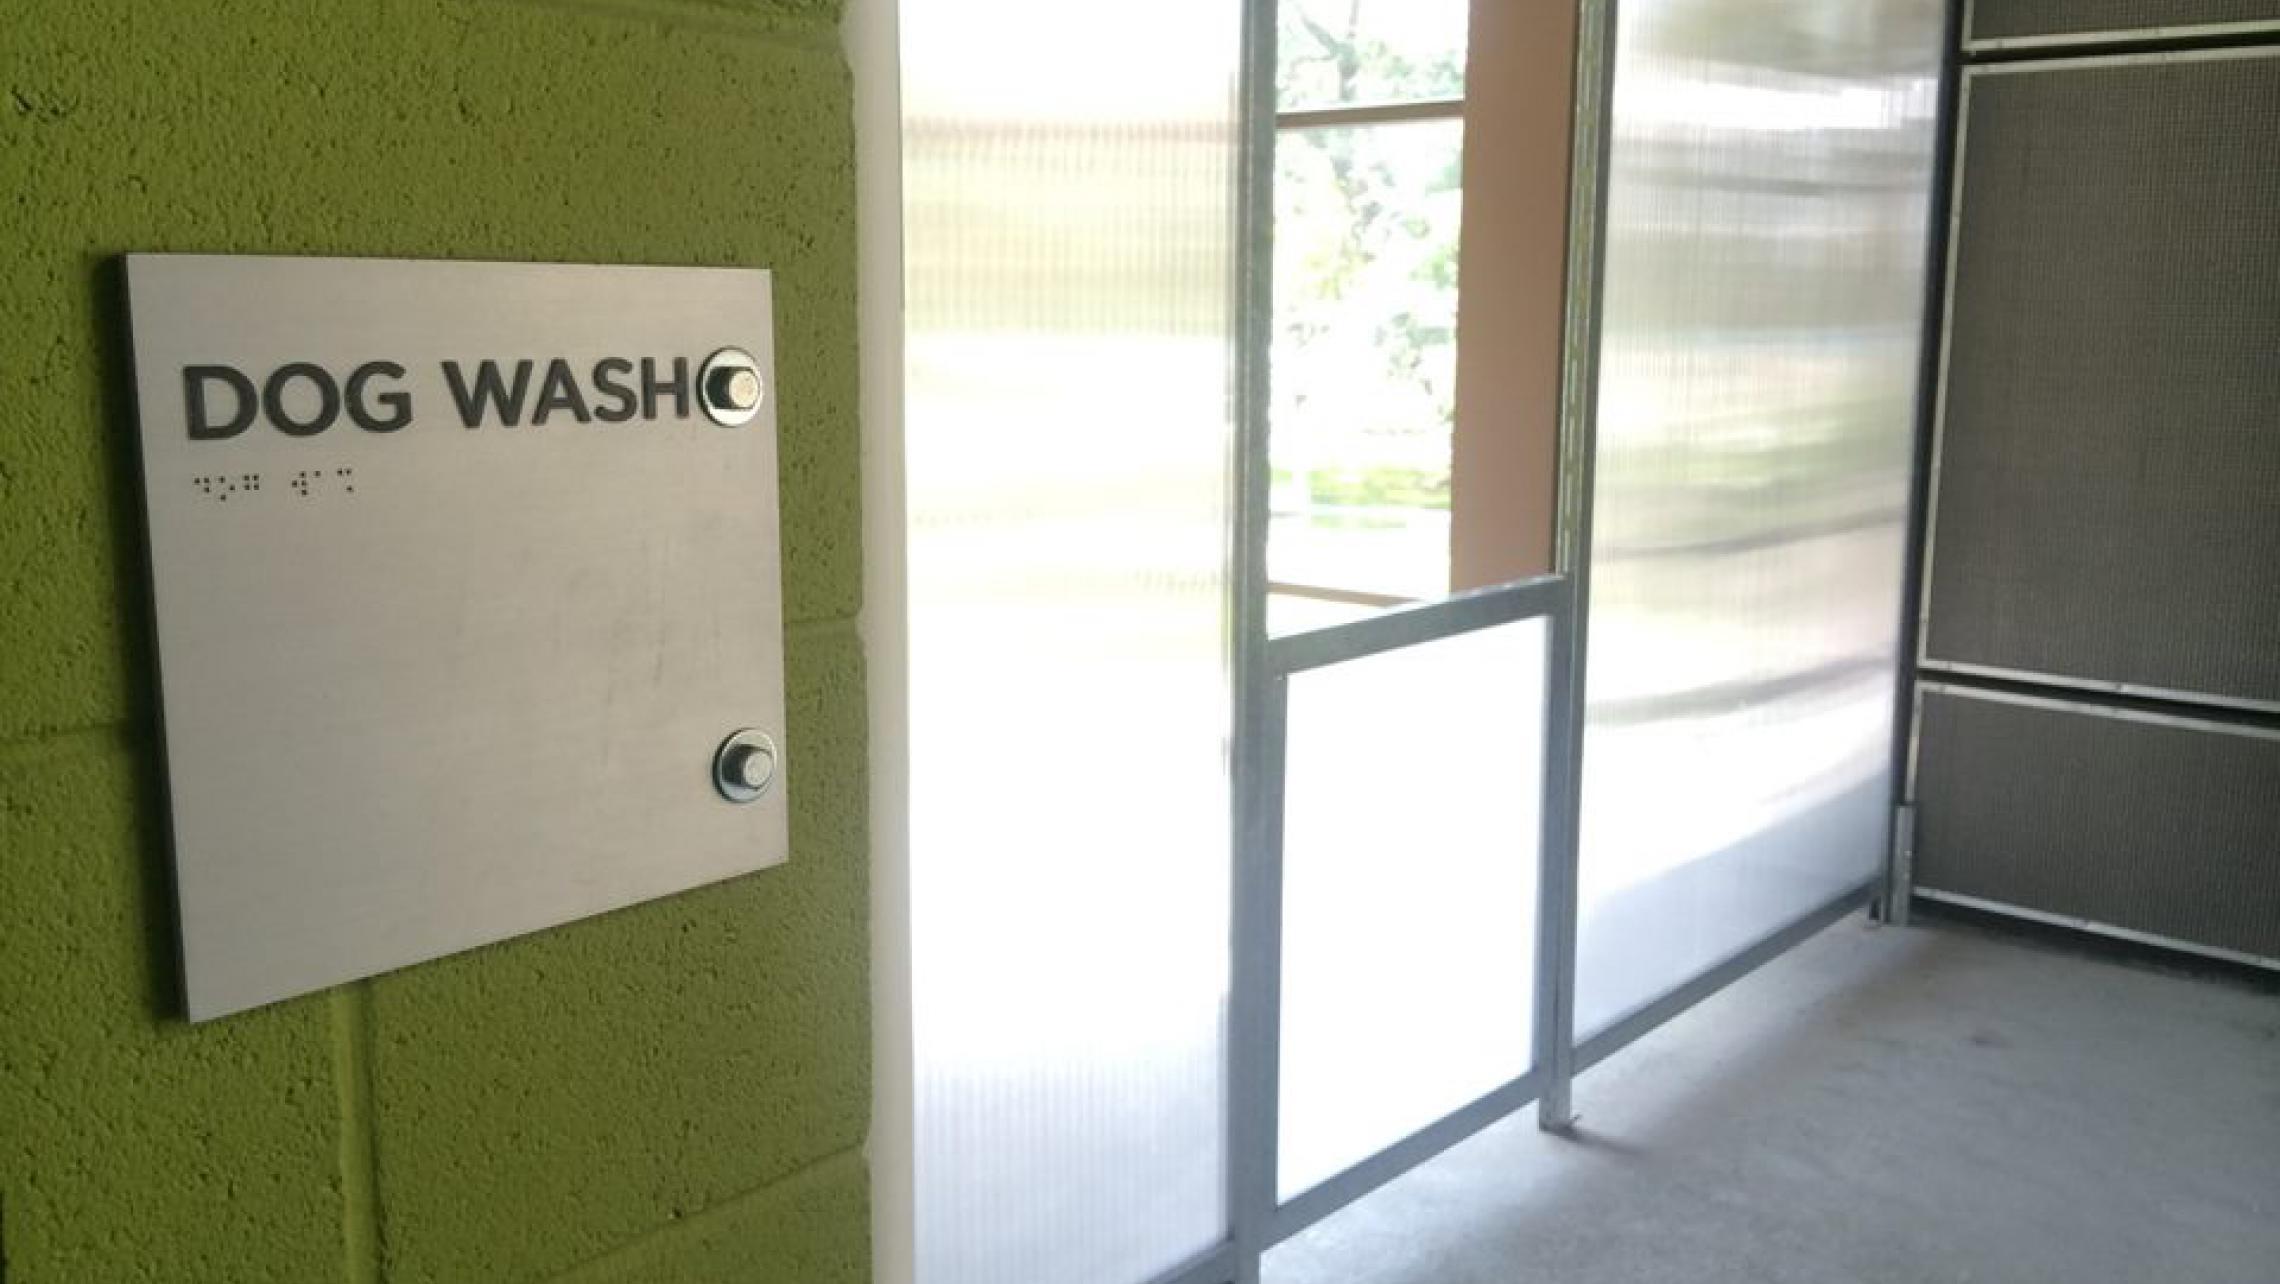 ULI Seven27 Apartments - Dog Wash in a Dog Friendly Building